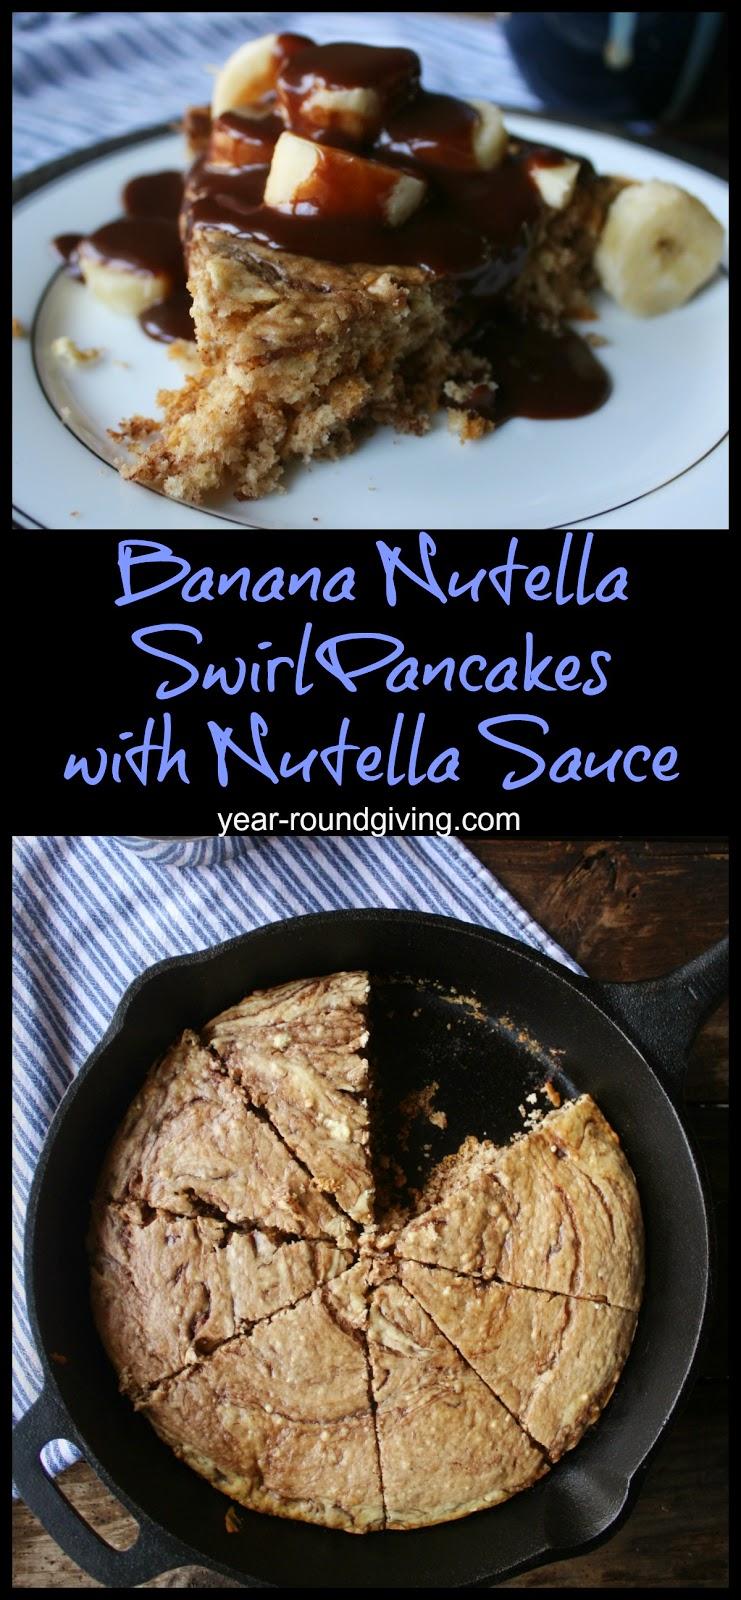 Banana Nutella Swirl Skillet Cake with Nutella Sauce